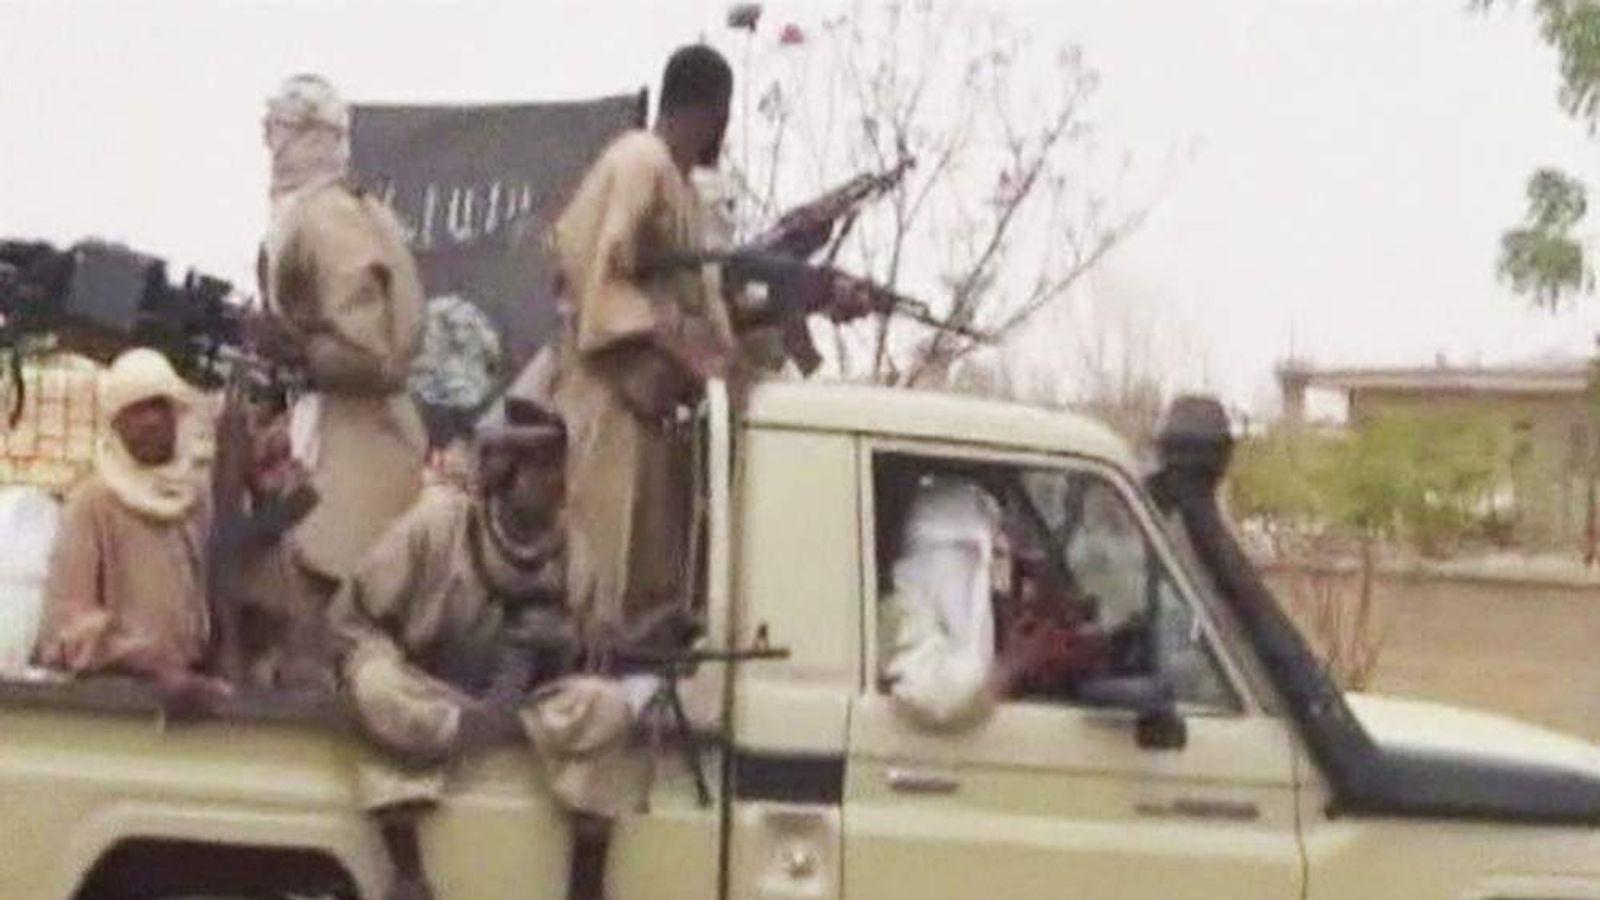 Islamist rebels in Mali